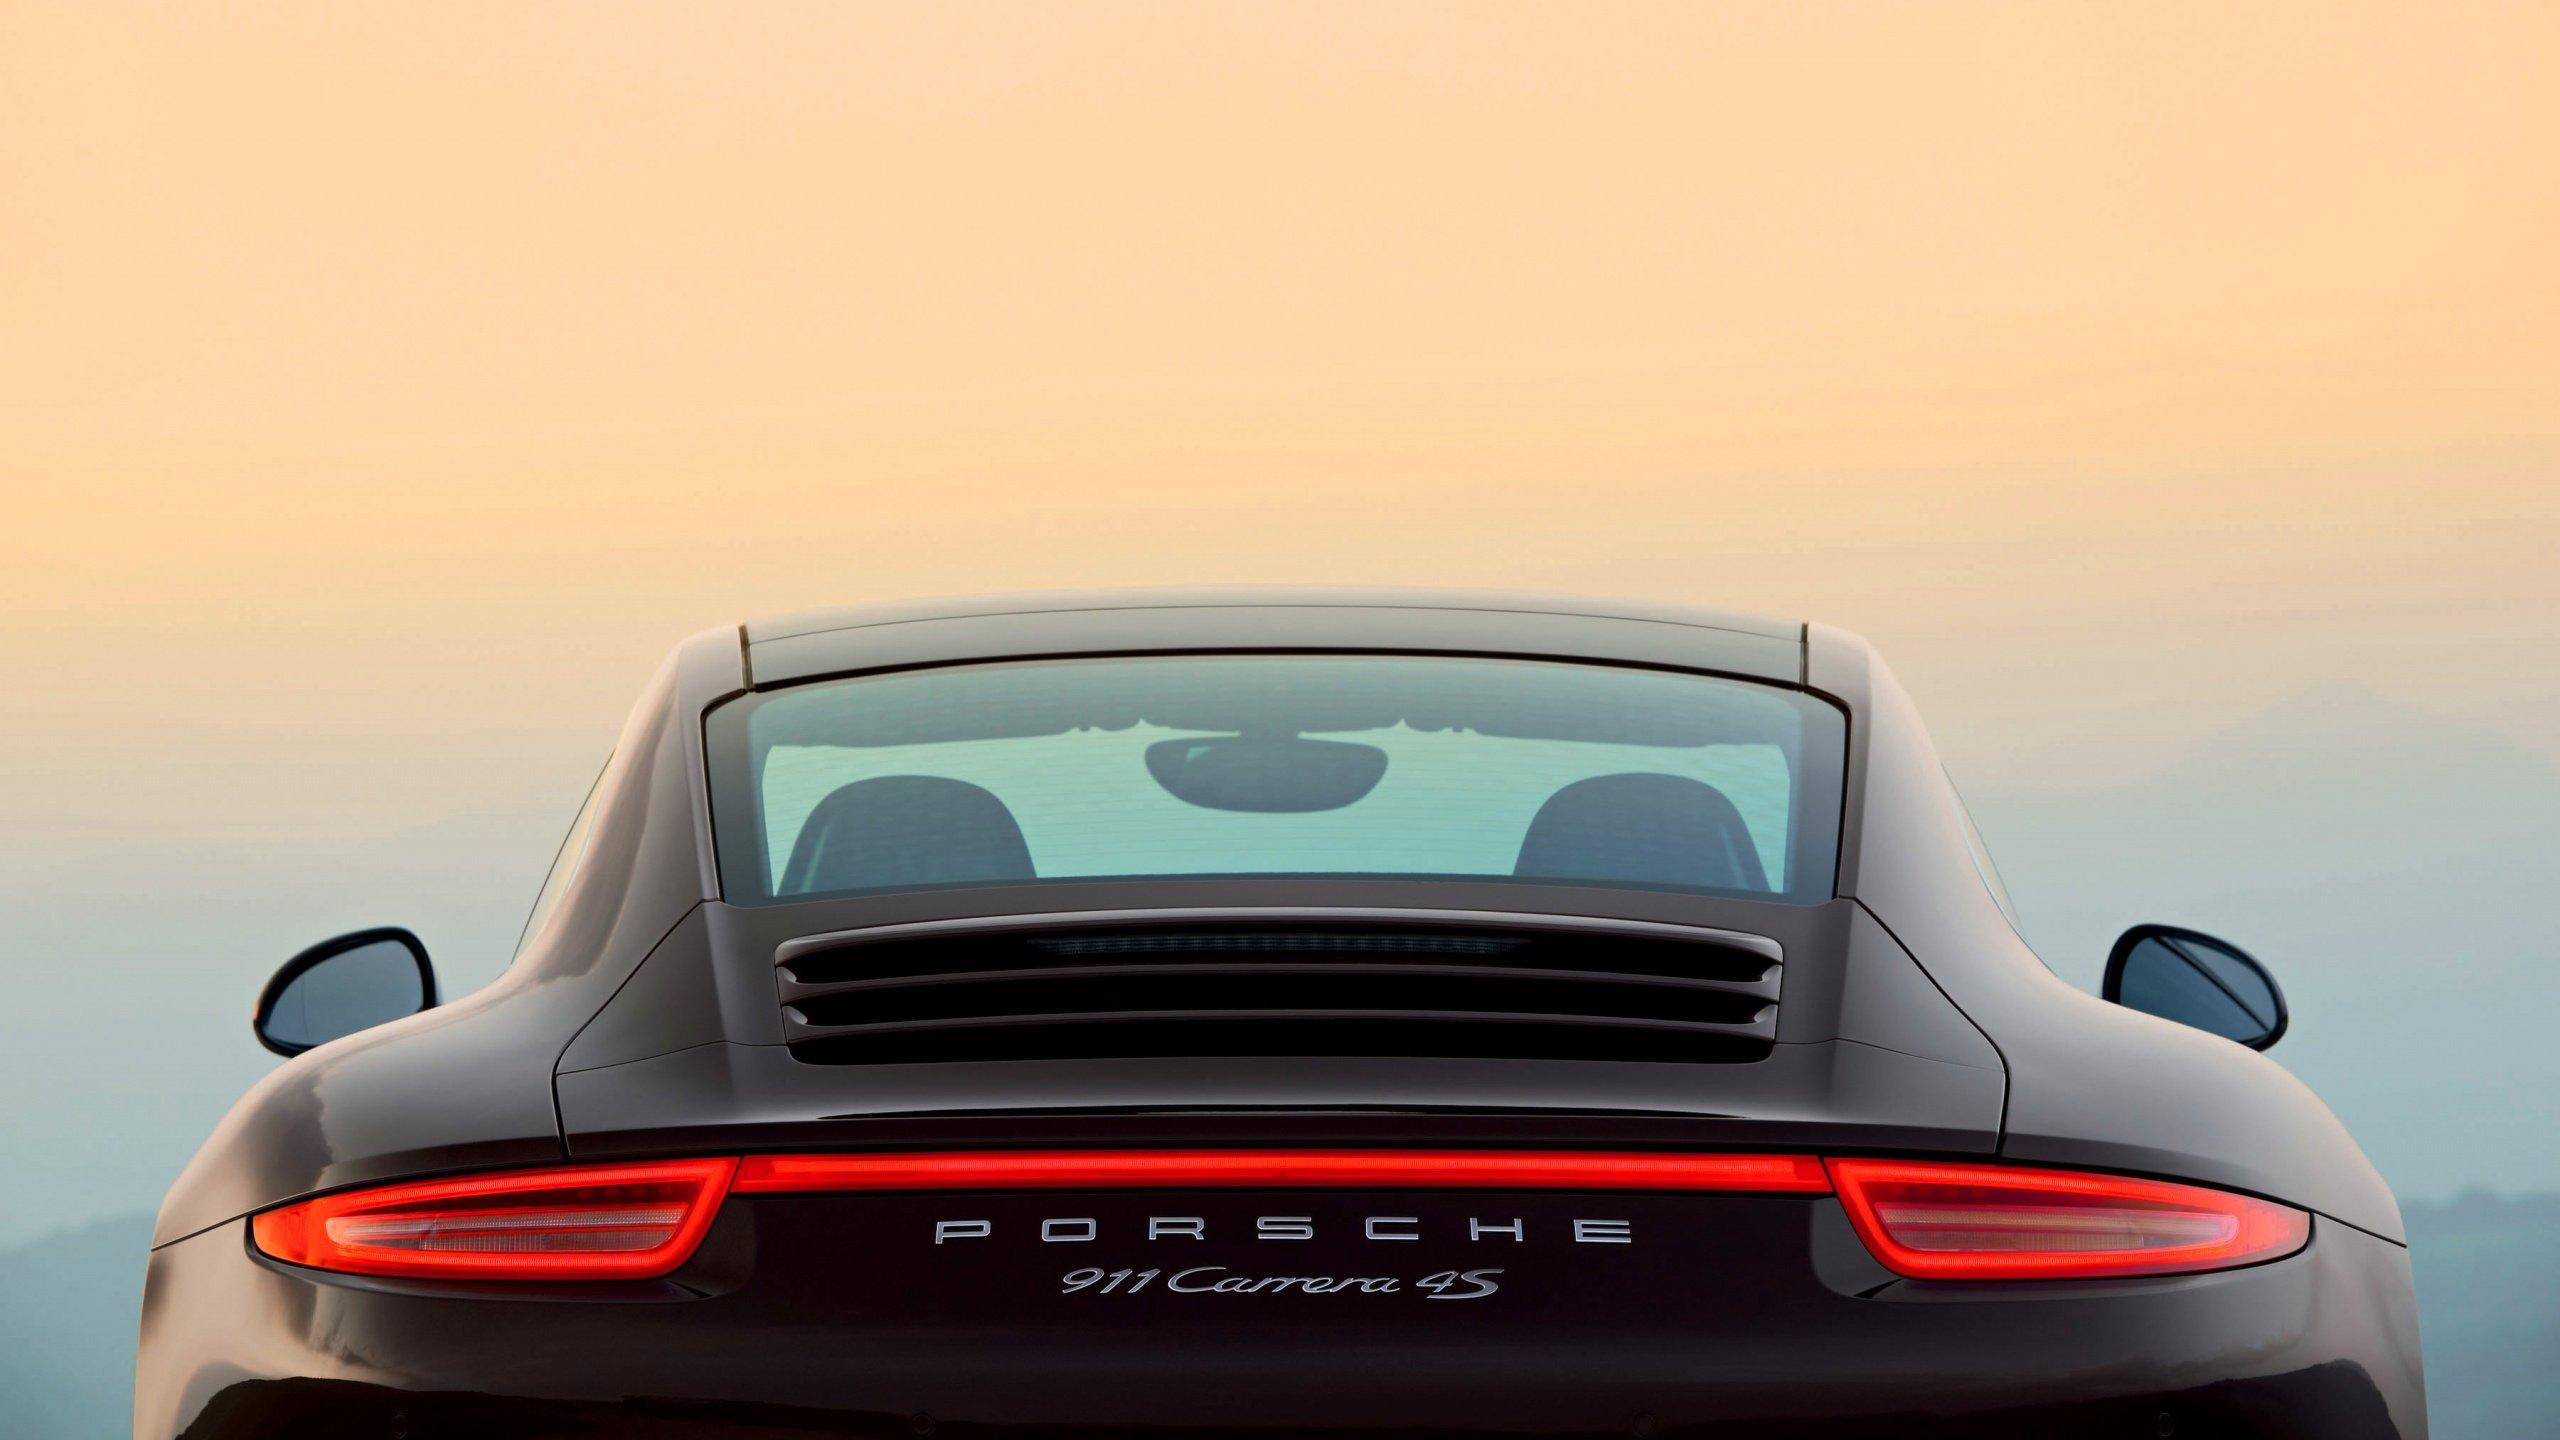 Wallpaper 2560x1440 Px Mobil Porsche 911 Carrera 2560x1440 Coolwallpapers 1421825 Hd Wallpapers Wallhere